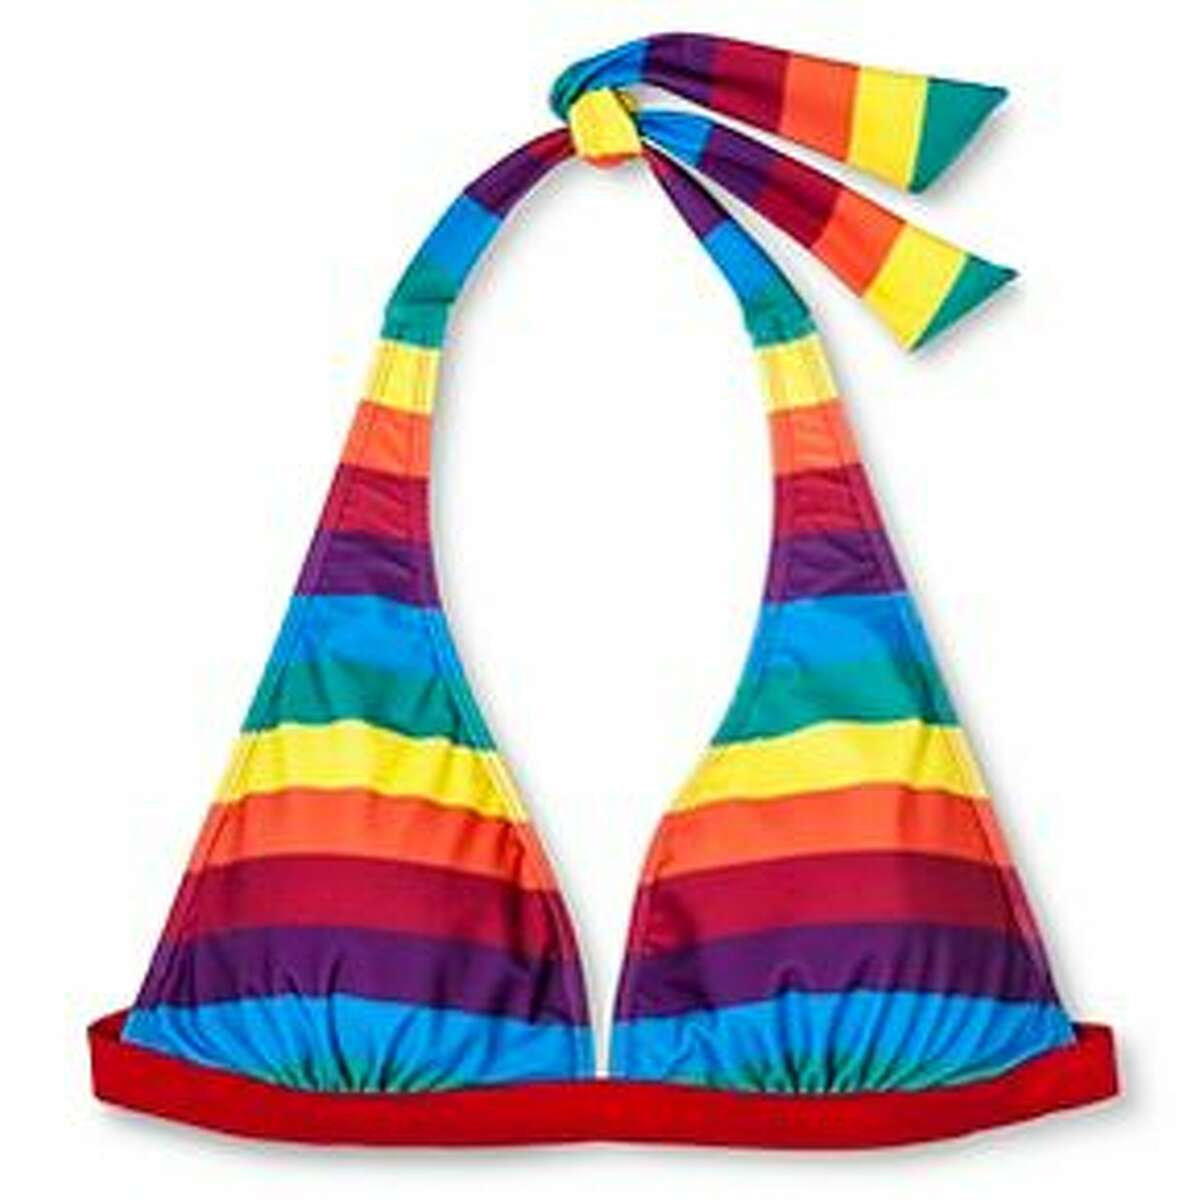 Rainbow bikini top, $12.99, Target